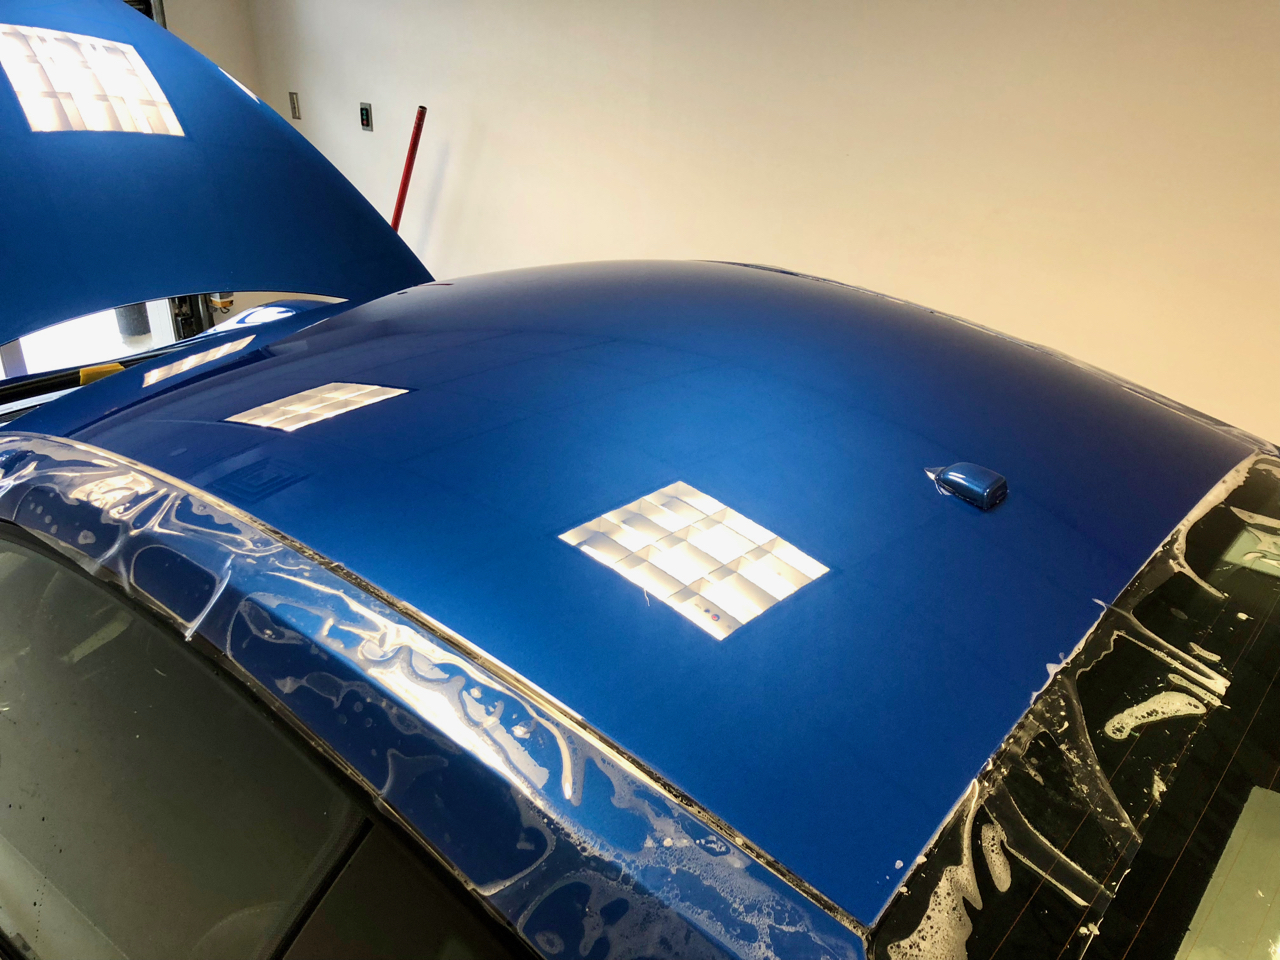 991.2 GT3 Blue  - 14.jpg